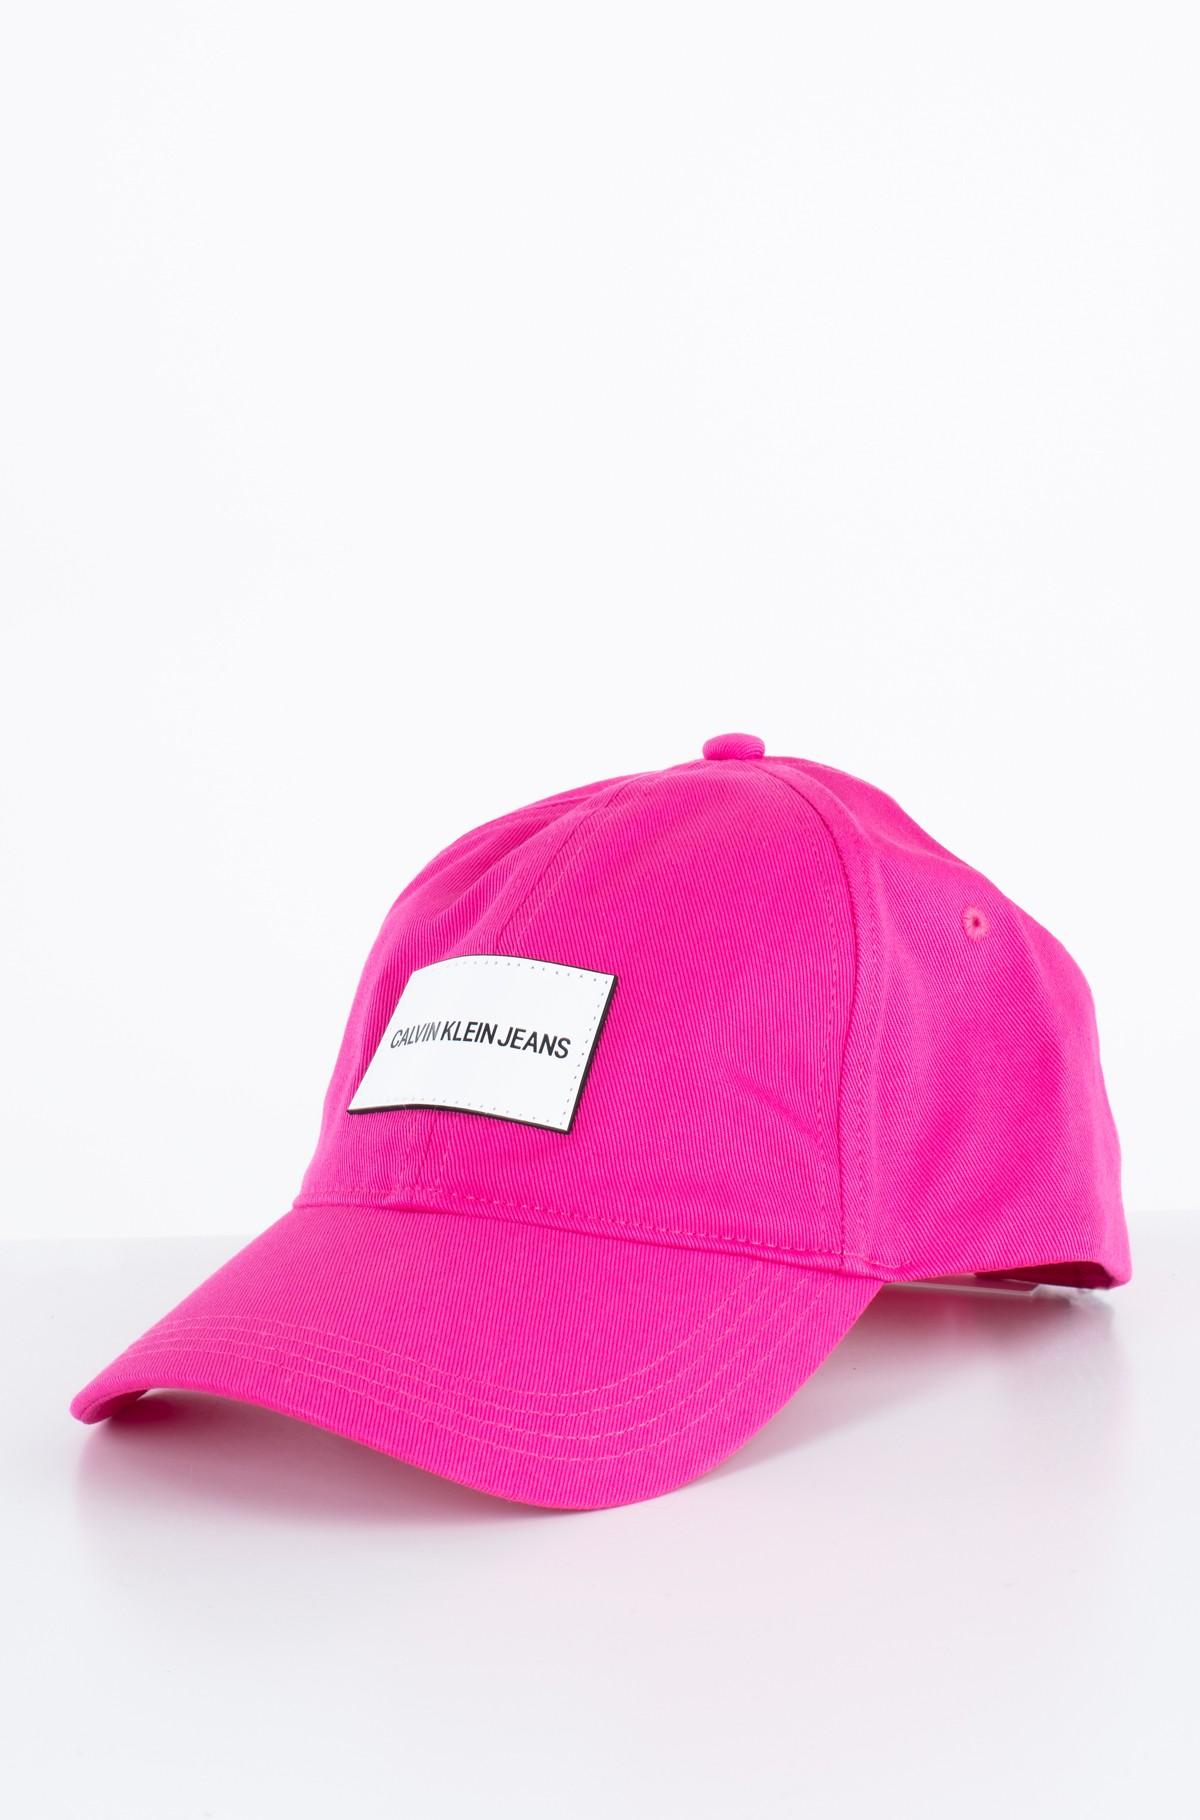 Kepurė su snapeliu  J CALVIN KLEIN JEANS CAP W-full-1